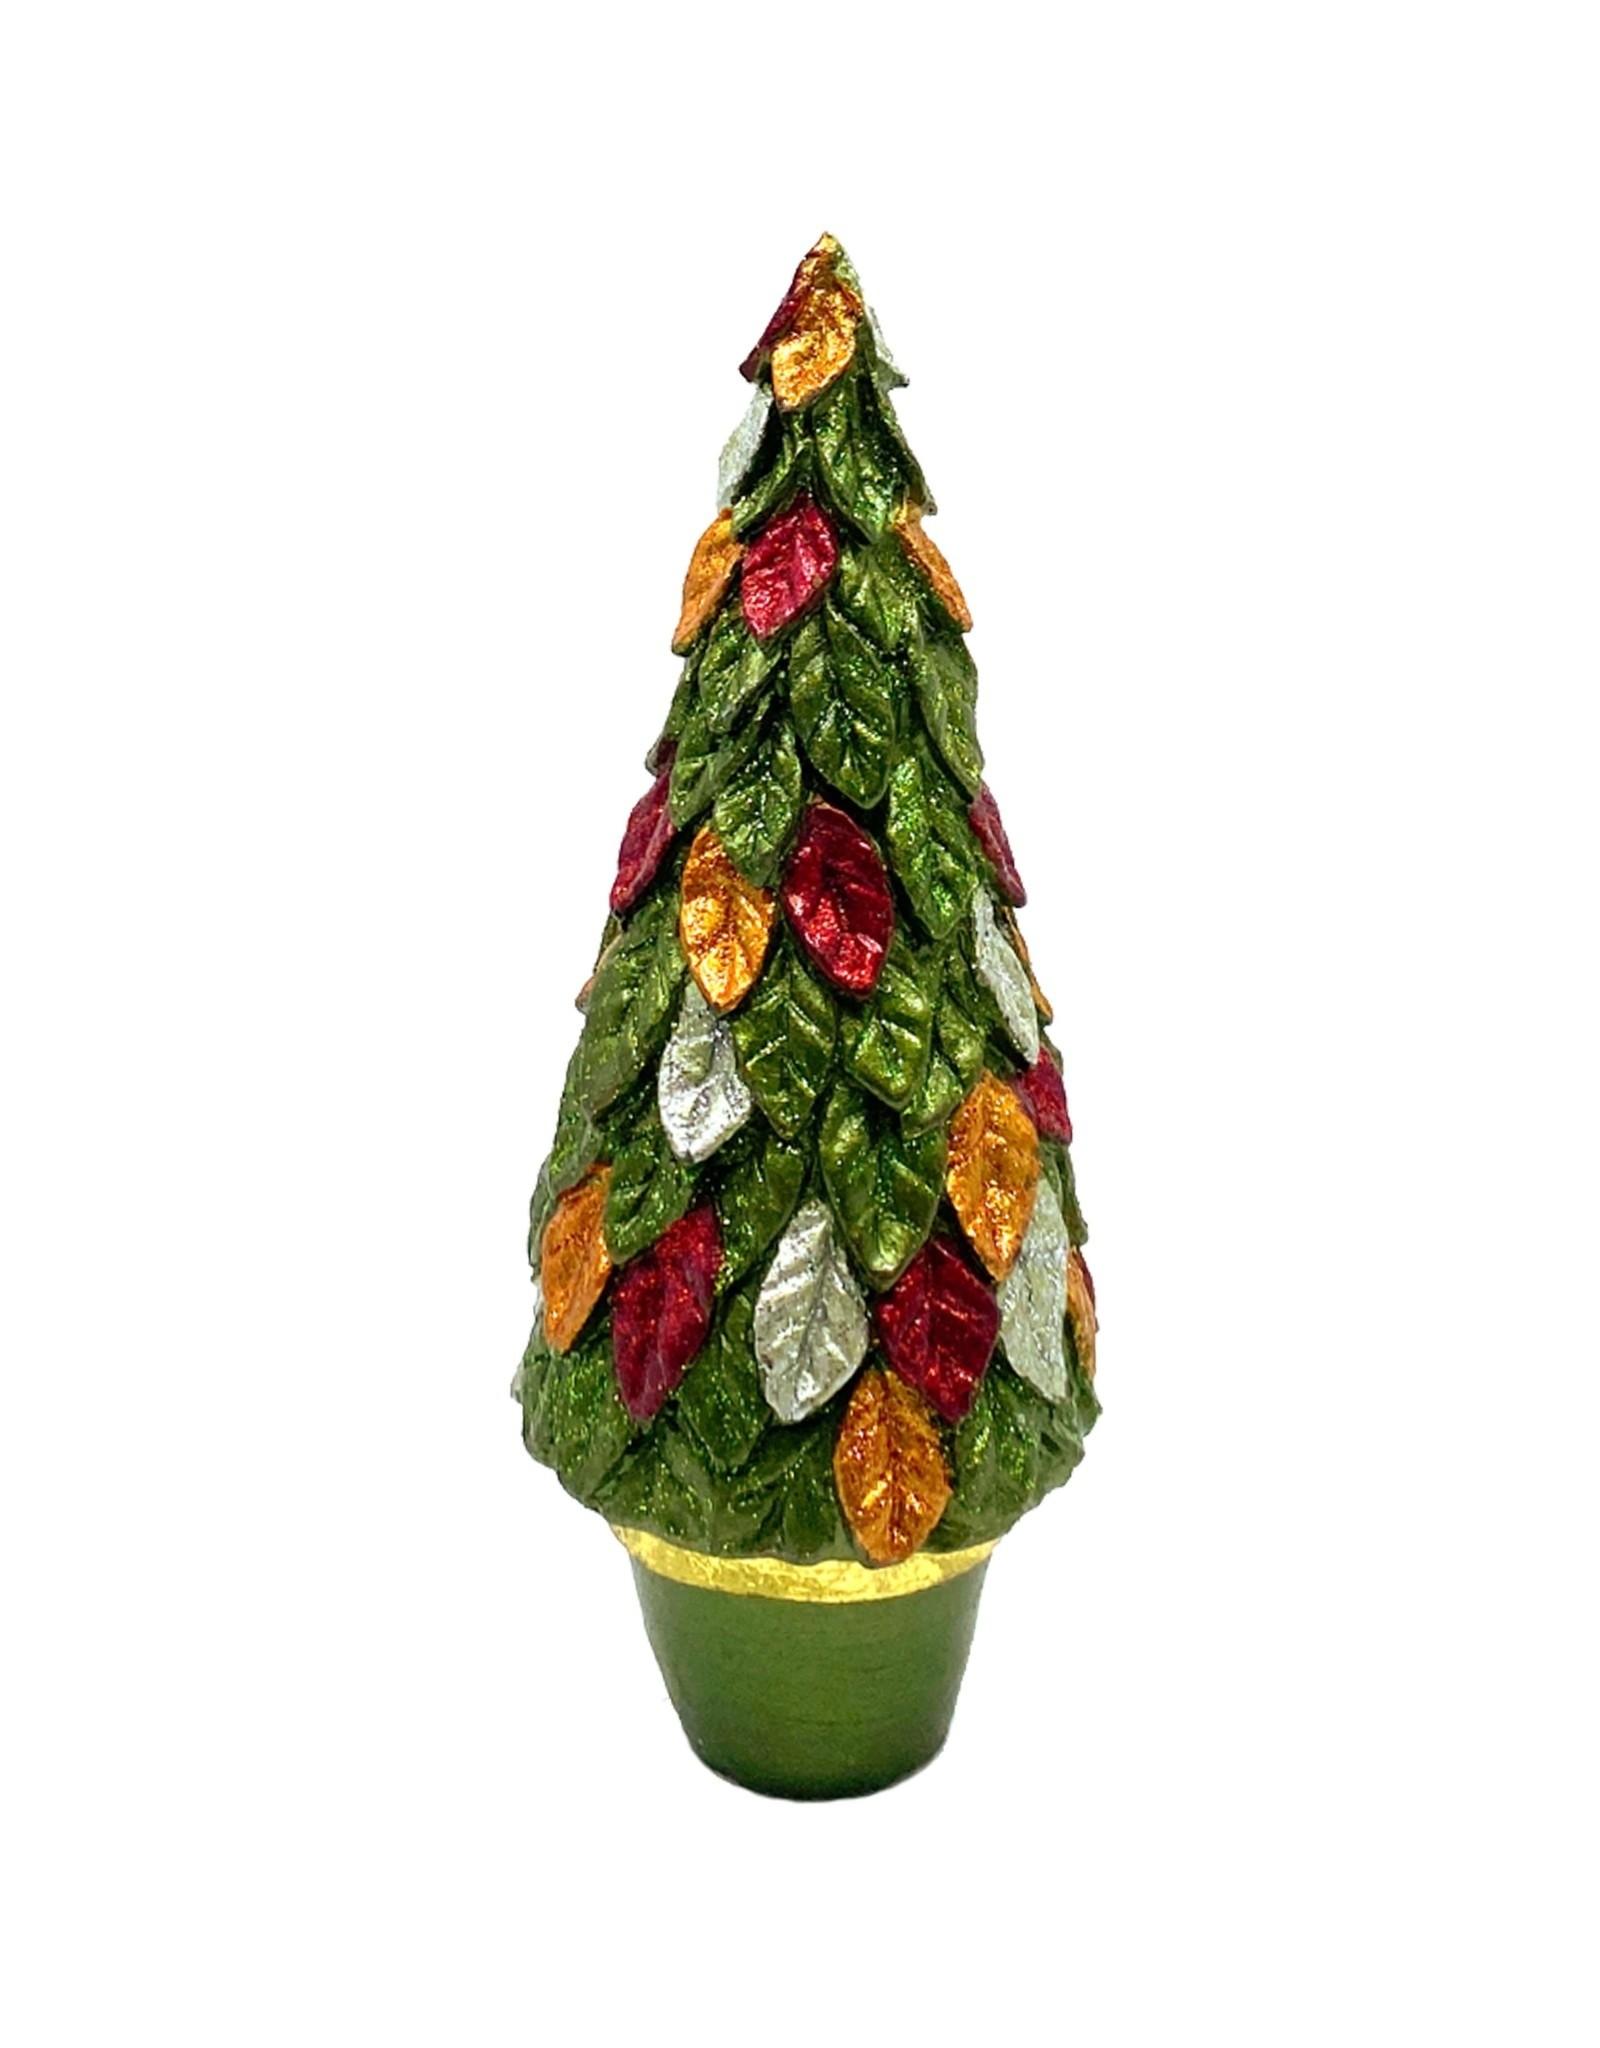 DEKORASYON SMALL LEAFY CONE TREE